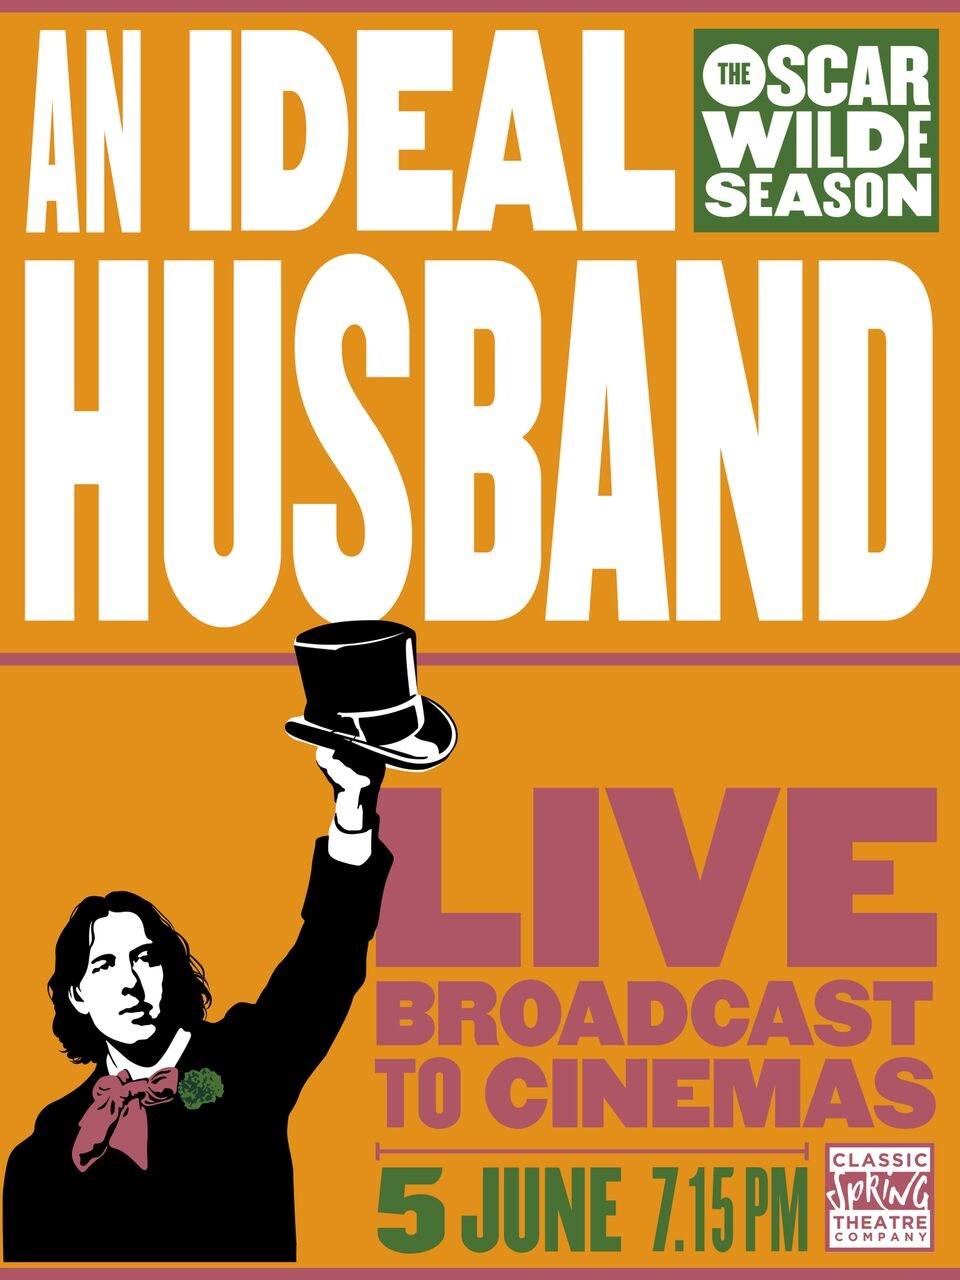 Oscar Wilde Season Live: An Ideal Husband